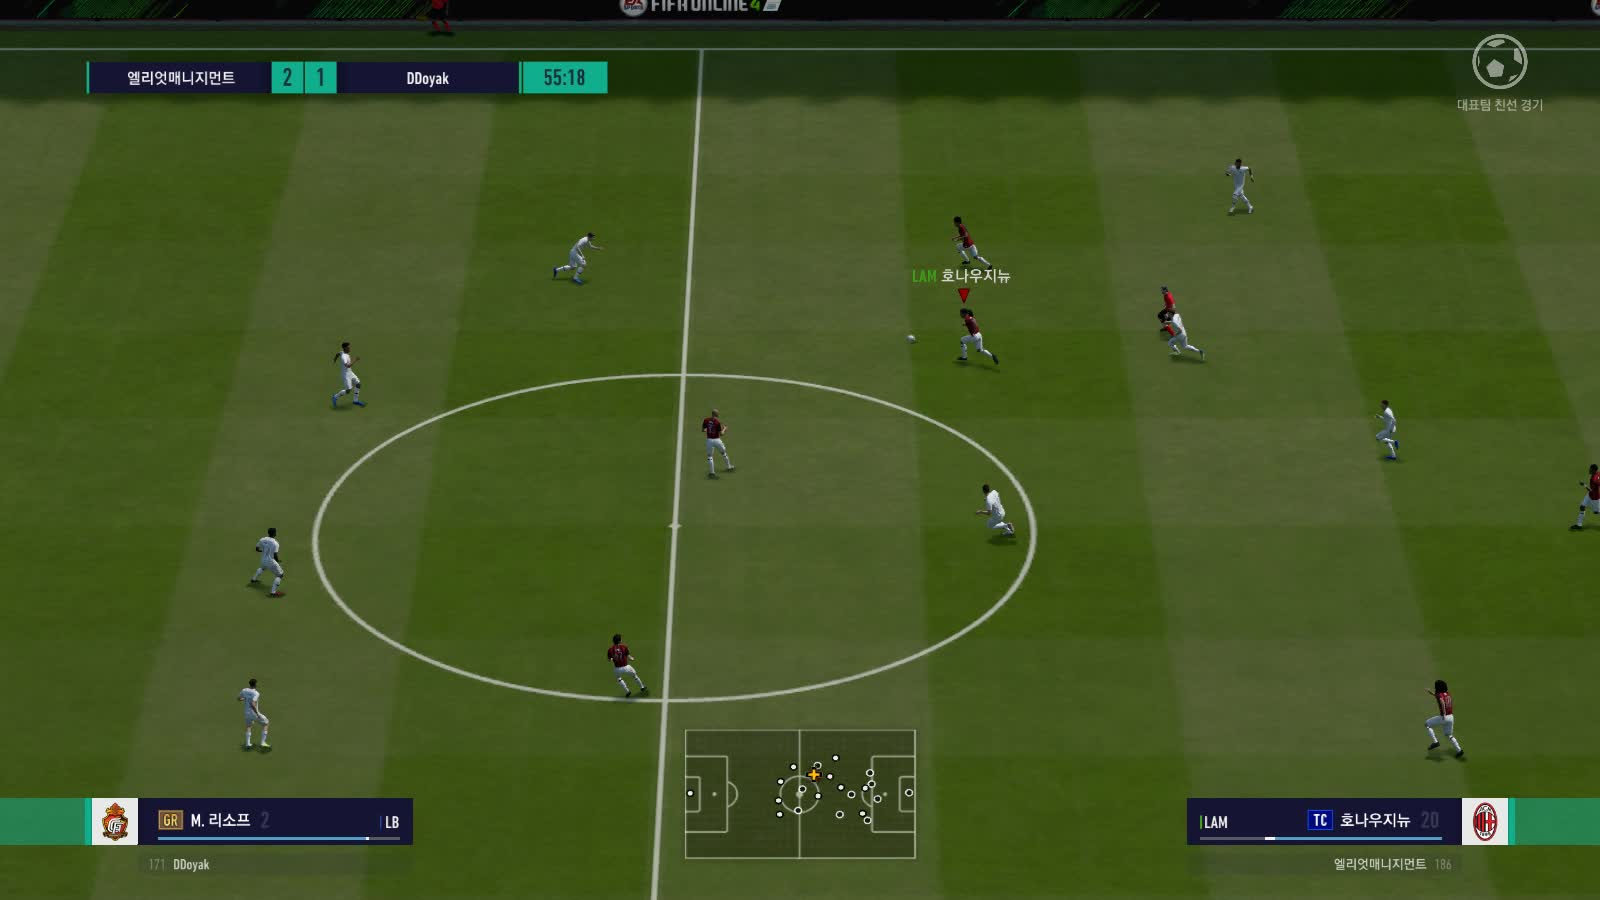 fifa, fifaonline4, FIFA Online 4 2019.05.03 - 21.25.21.03.DVR GIFs